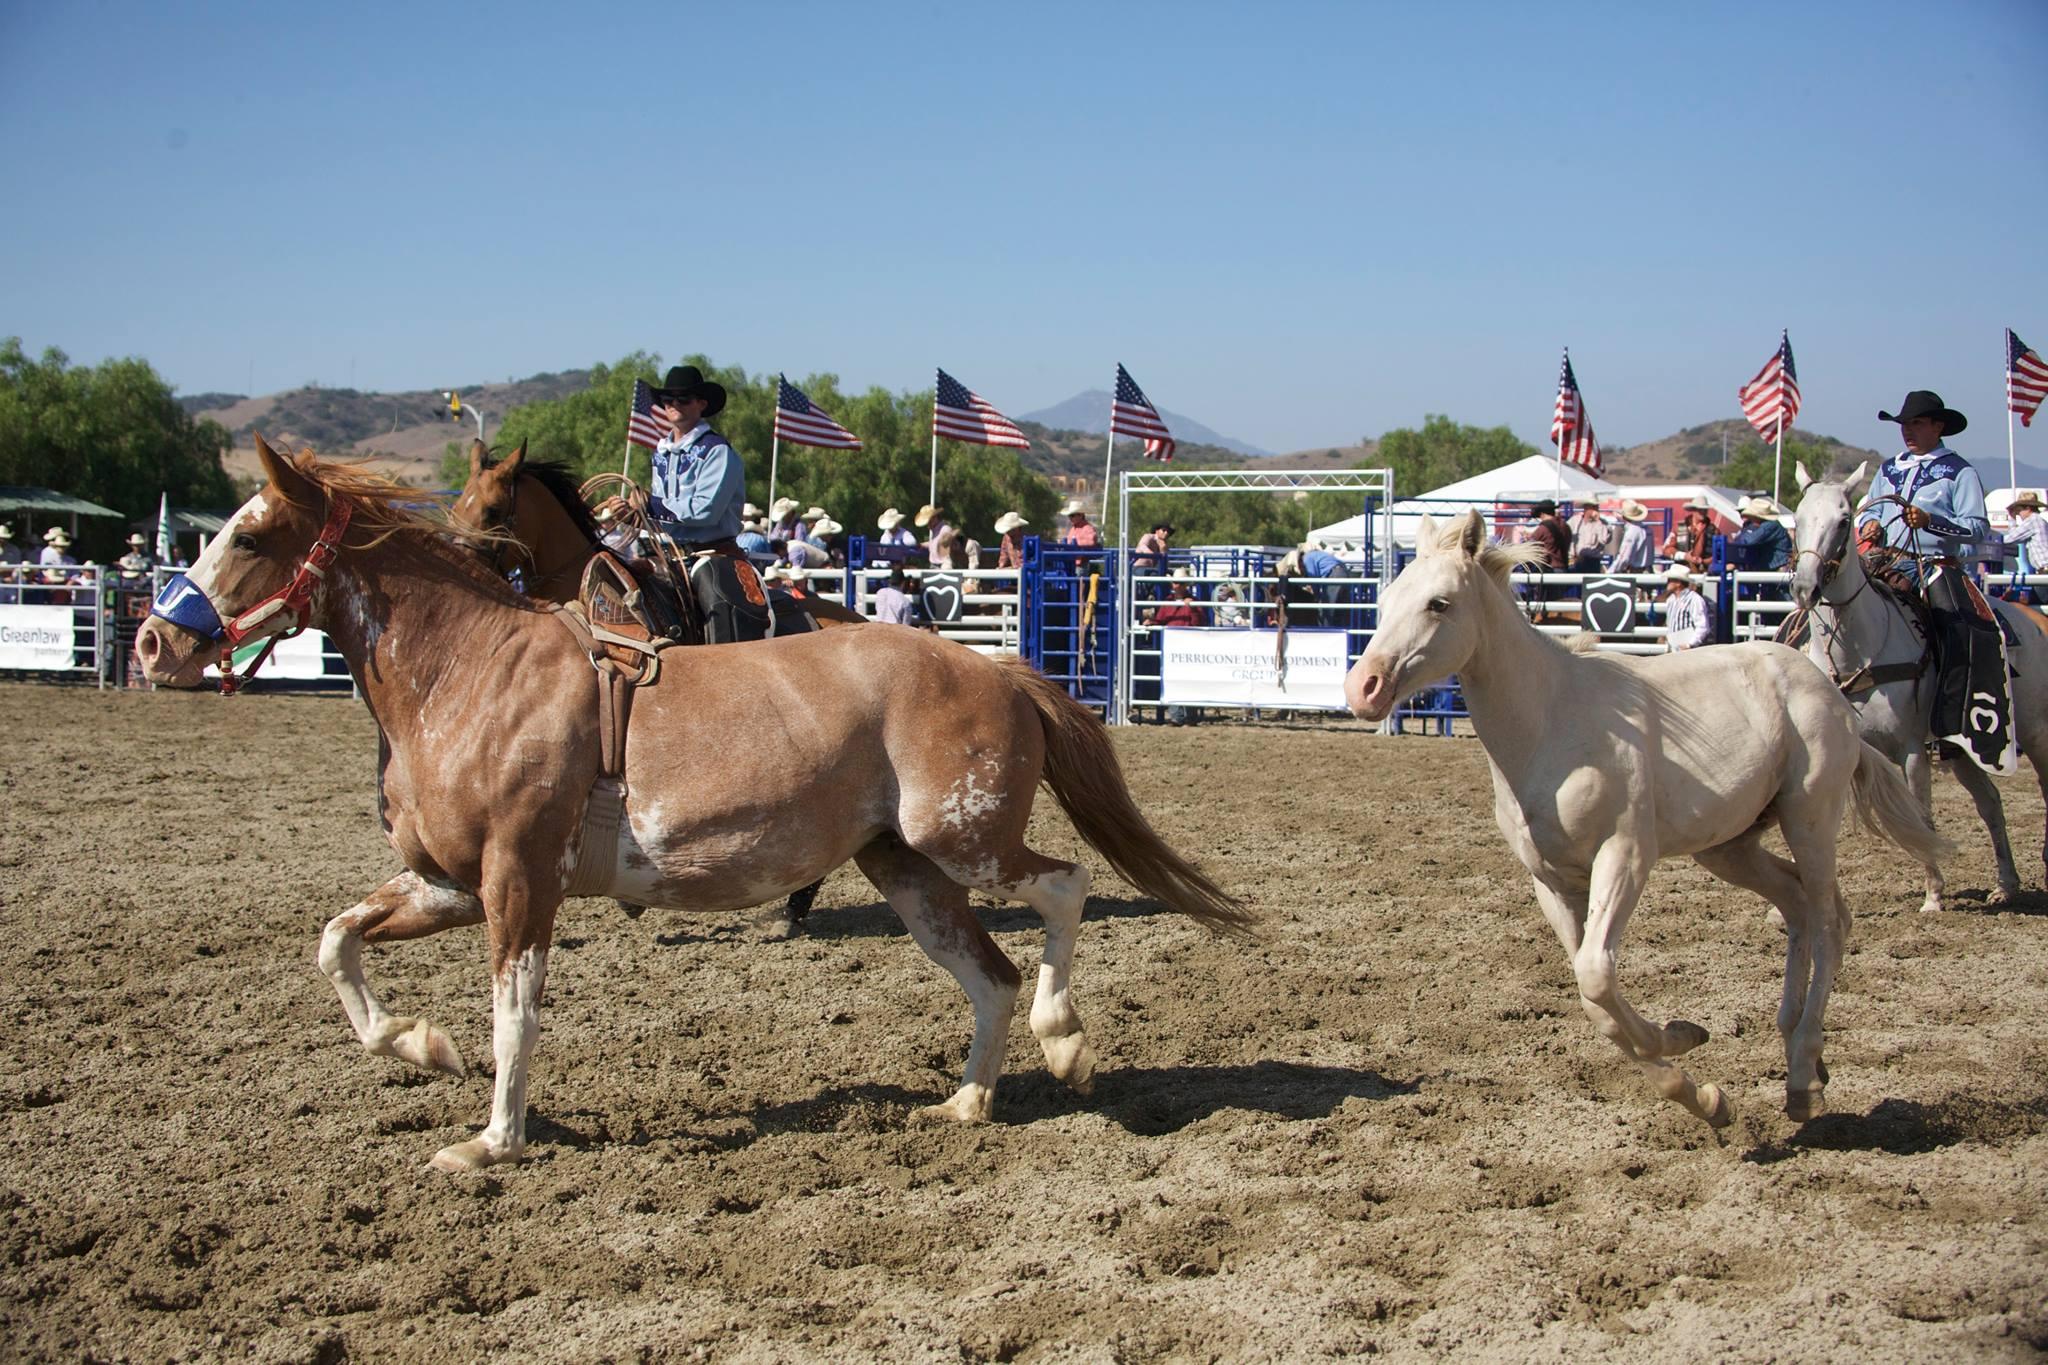 San Juan Capistrano Rodeo Saturday August 26 2017 South